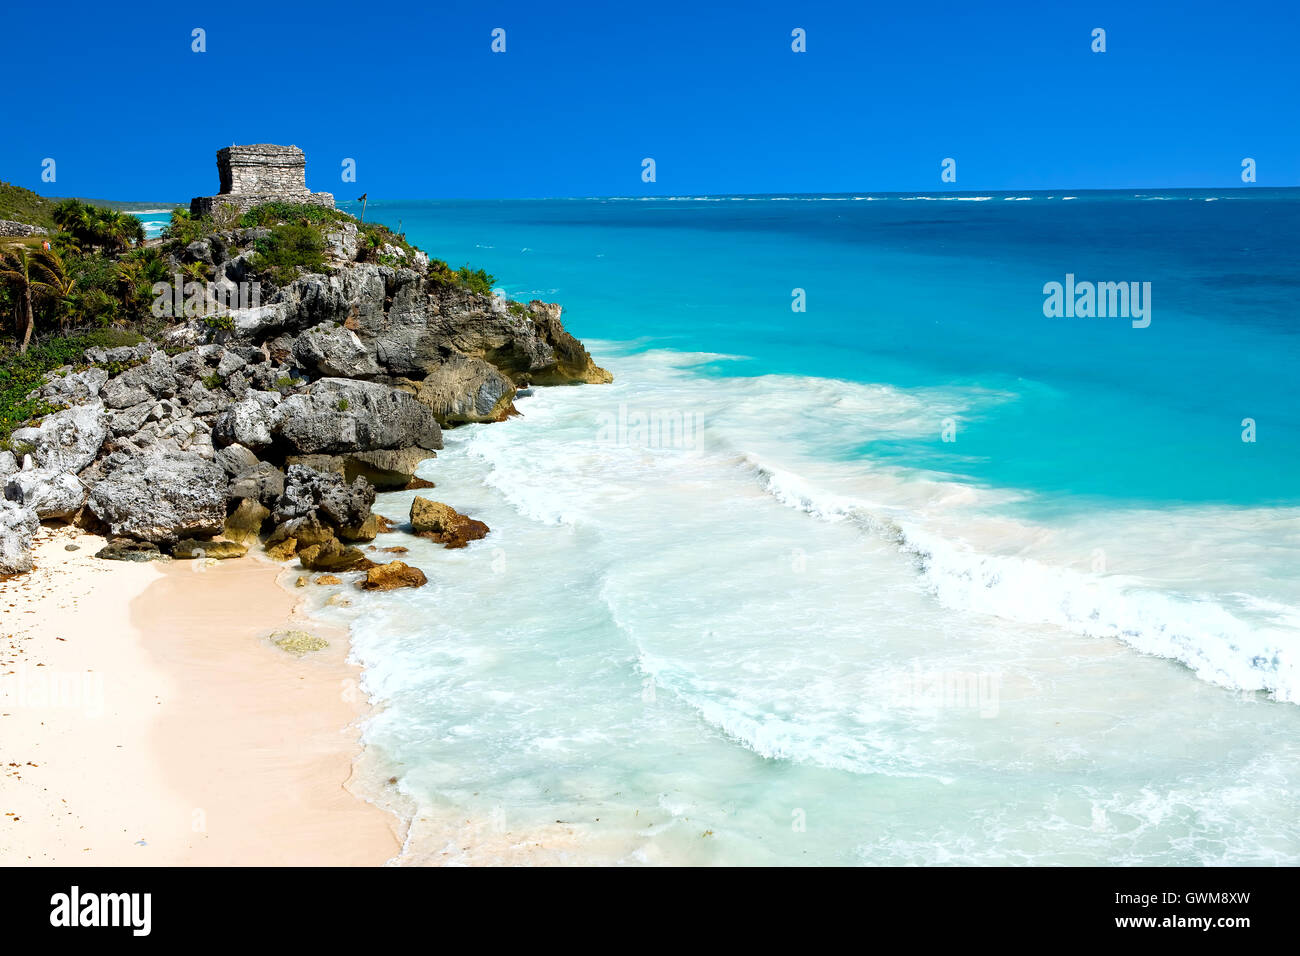 Ruins of  Tulum, riviera Maya, Mexico - Stock Image